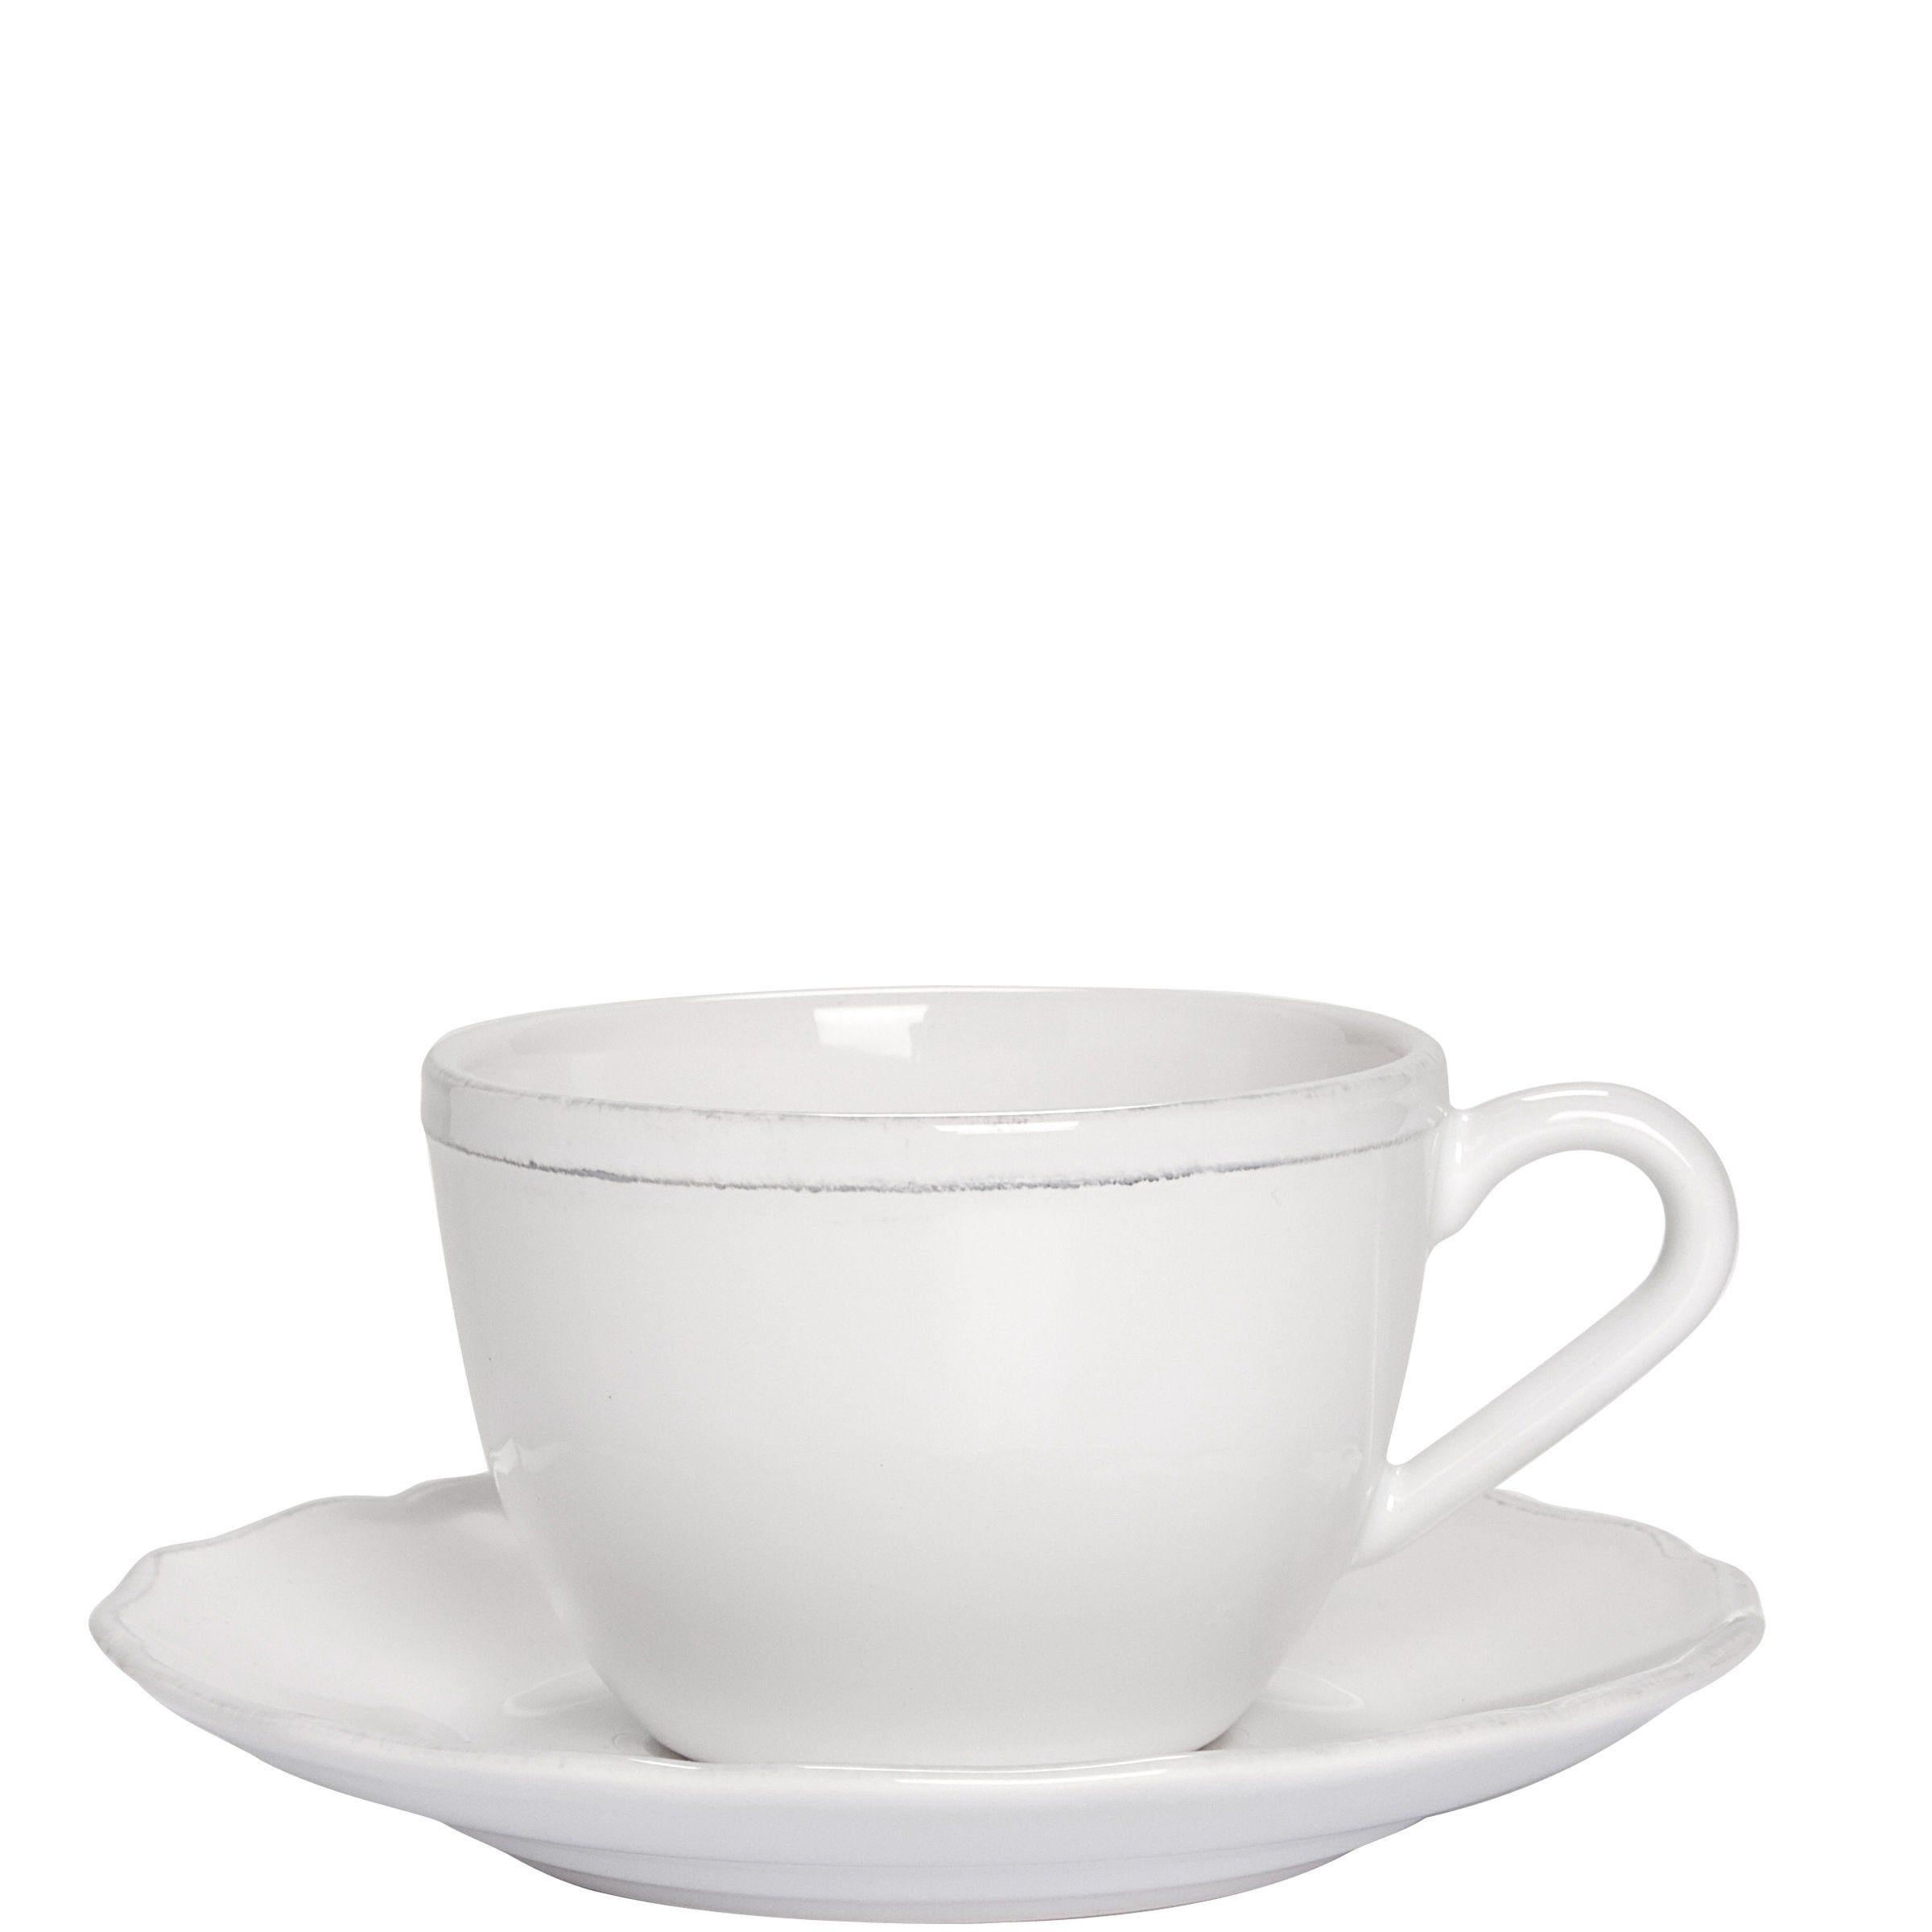 BUTLERS EATON PLACE »Kaffeetasse mit Untertasse«